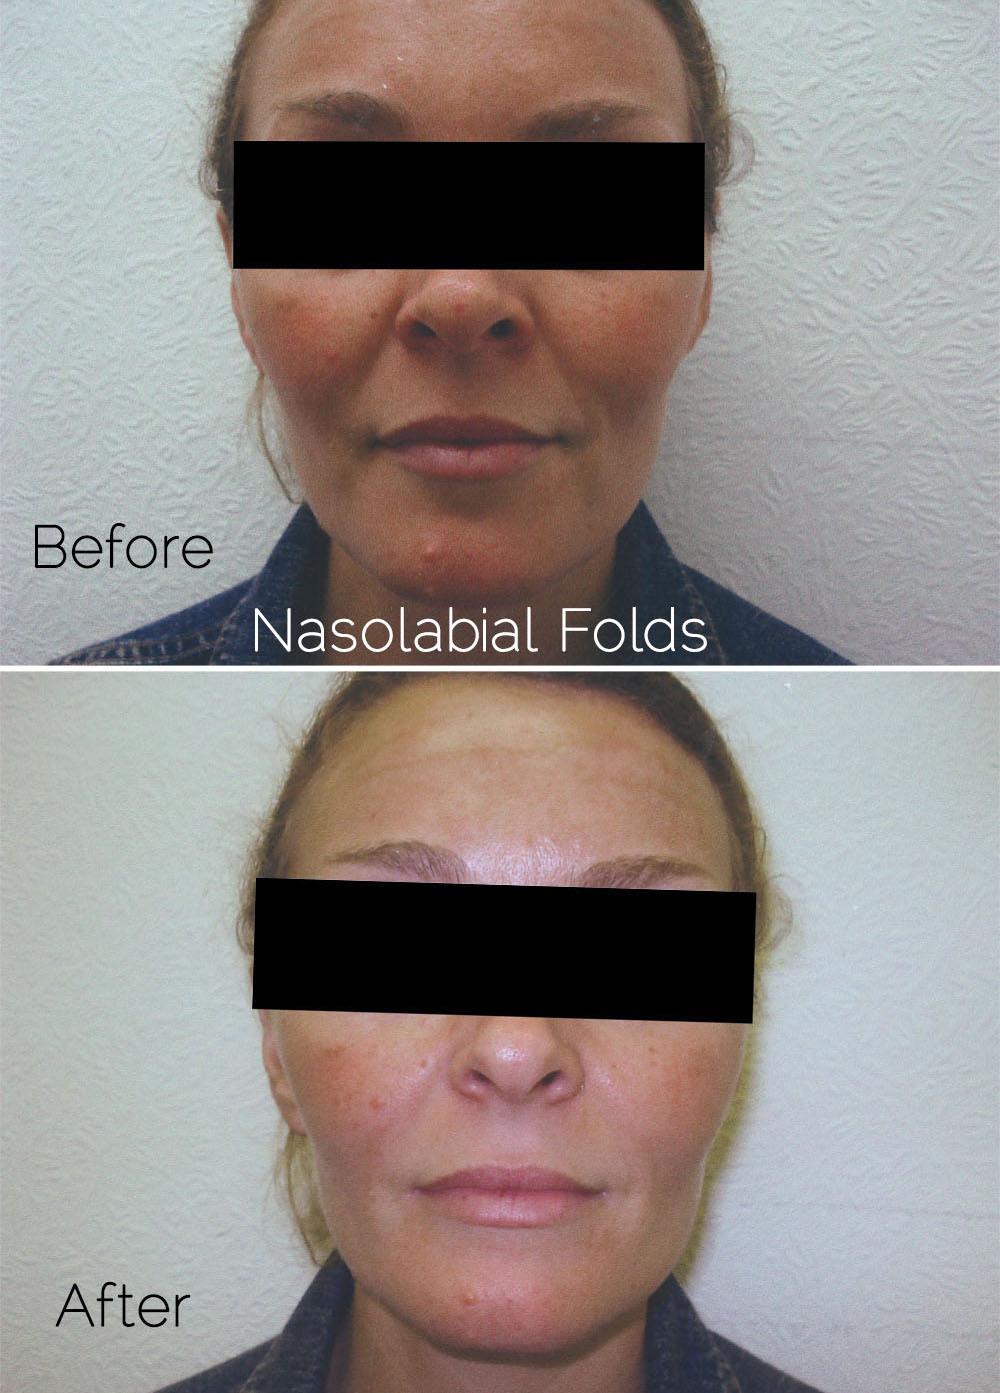 Nasolabial fold filler